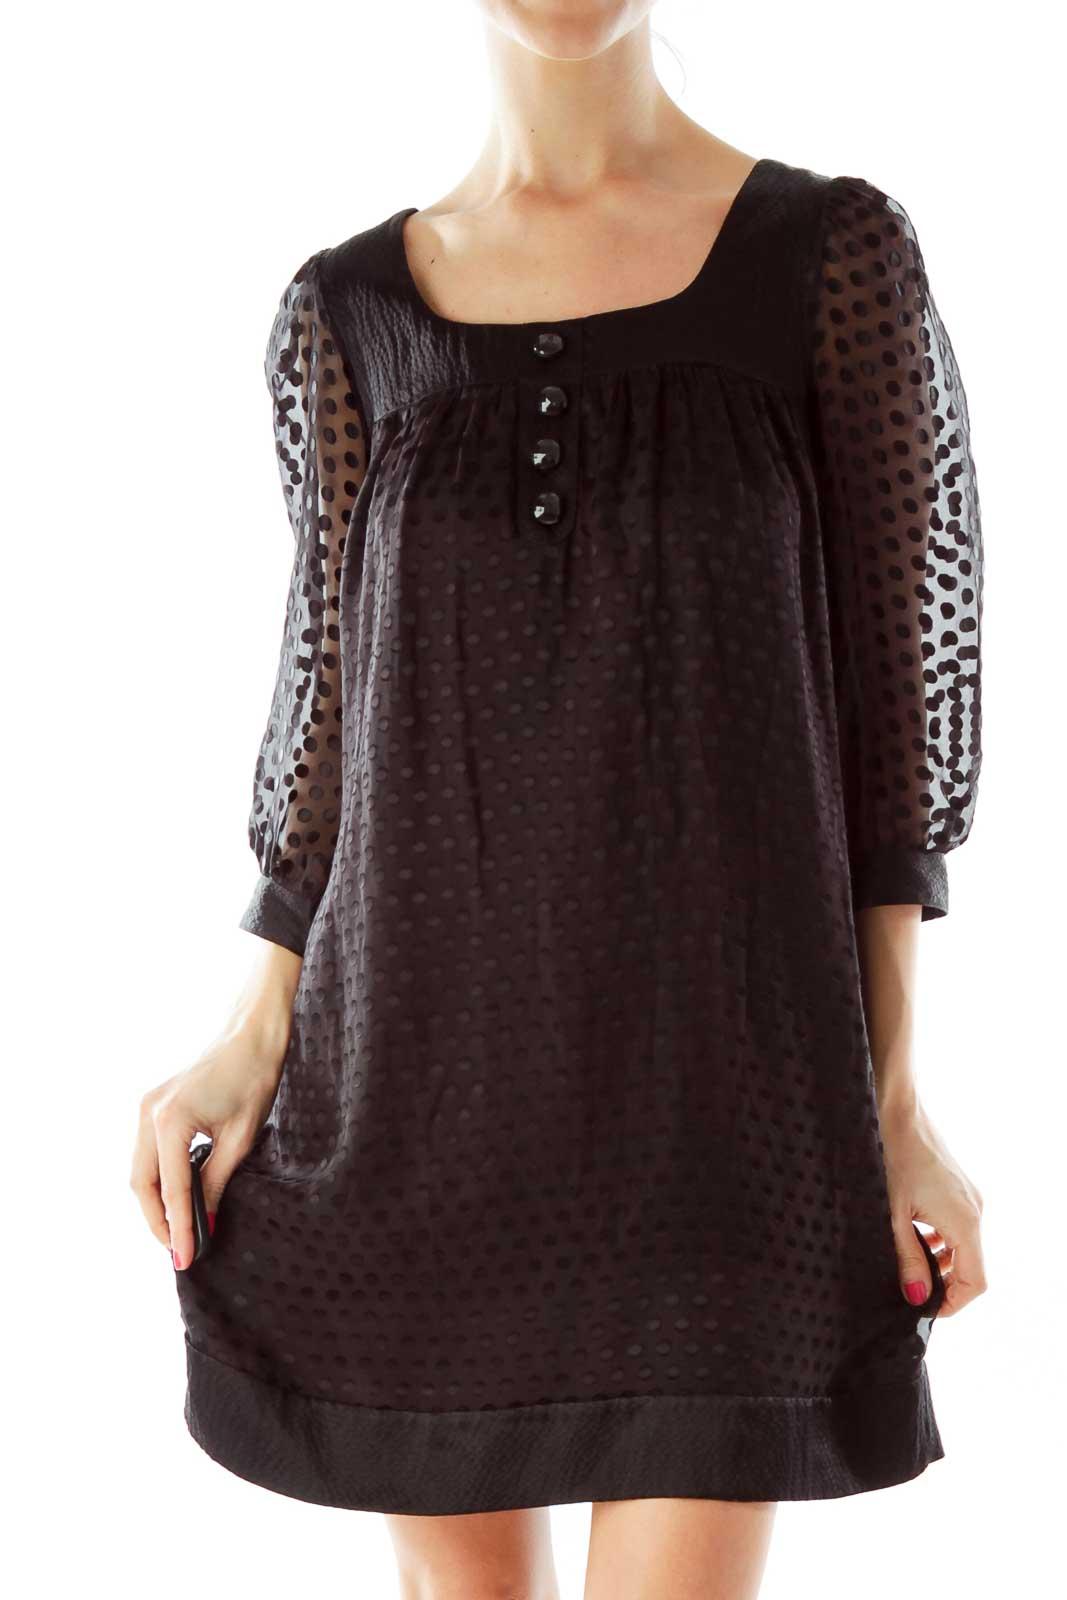 Black Polka-Dot Doll Dress Front